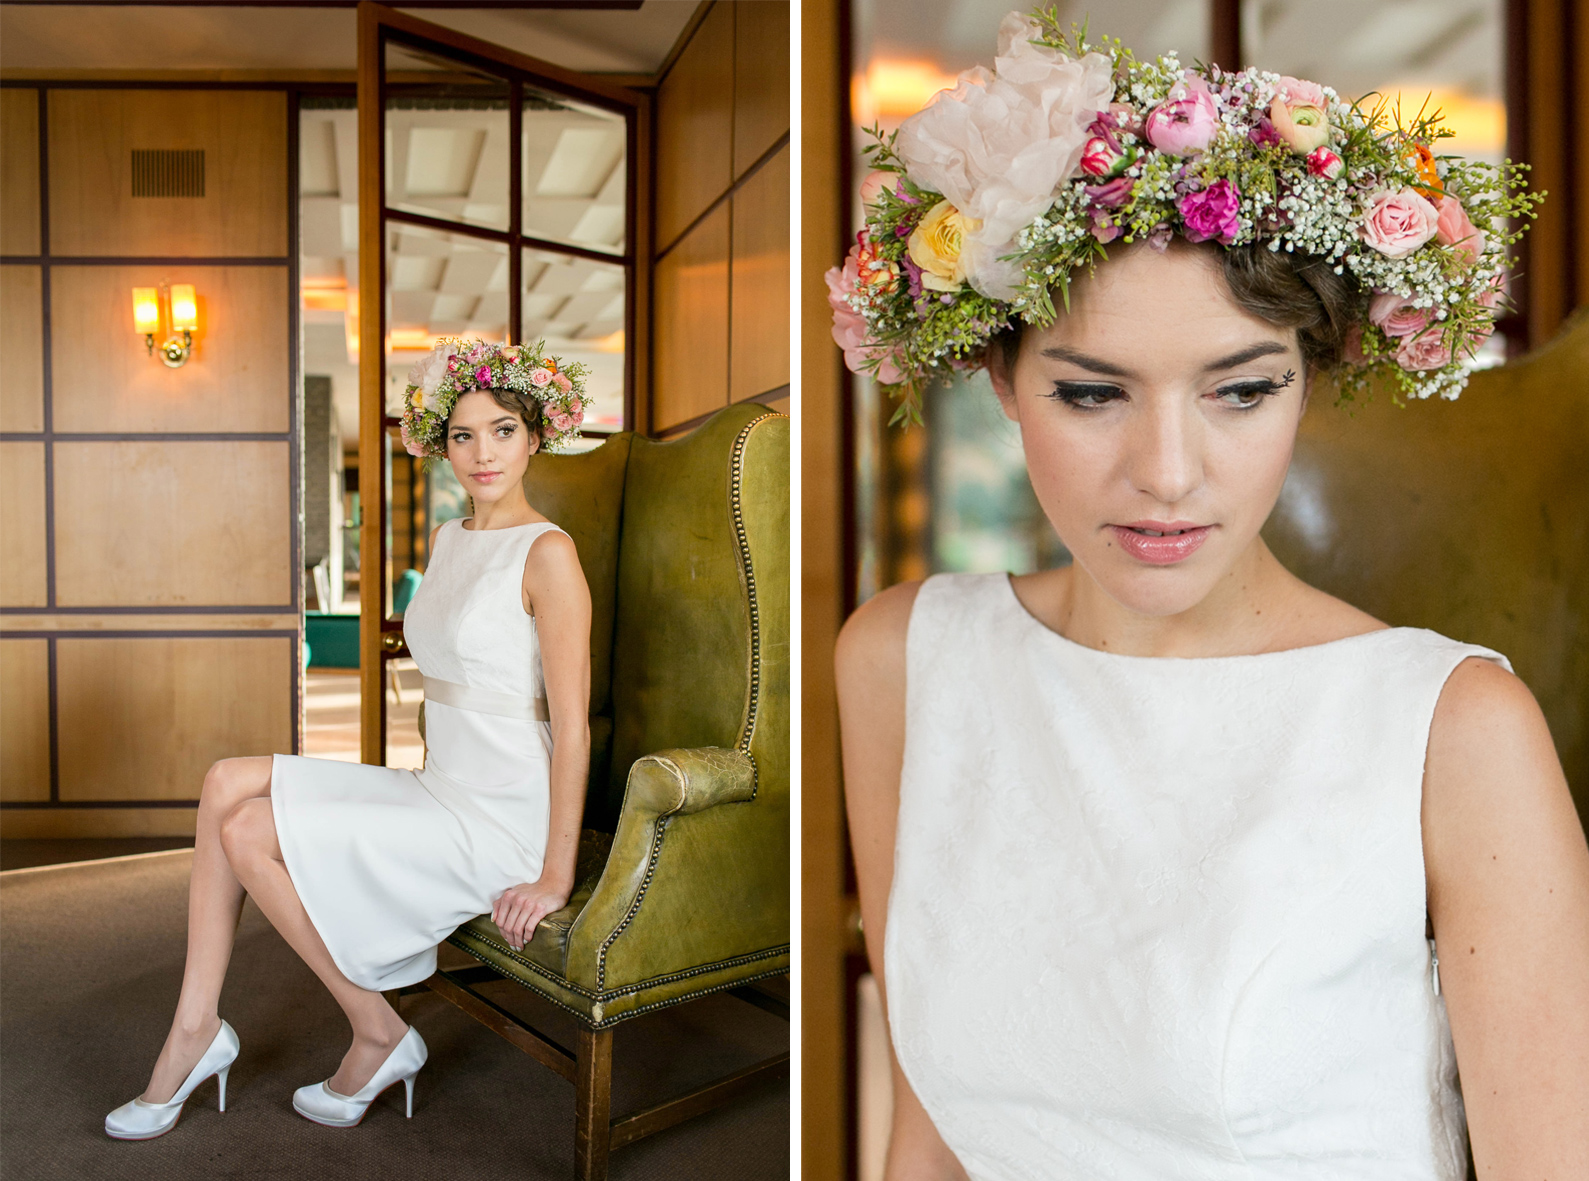 Pan-Am-Lounge_Hochzeitsfotografie-Berlin-1.jpg